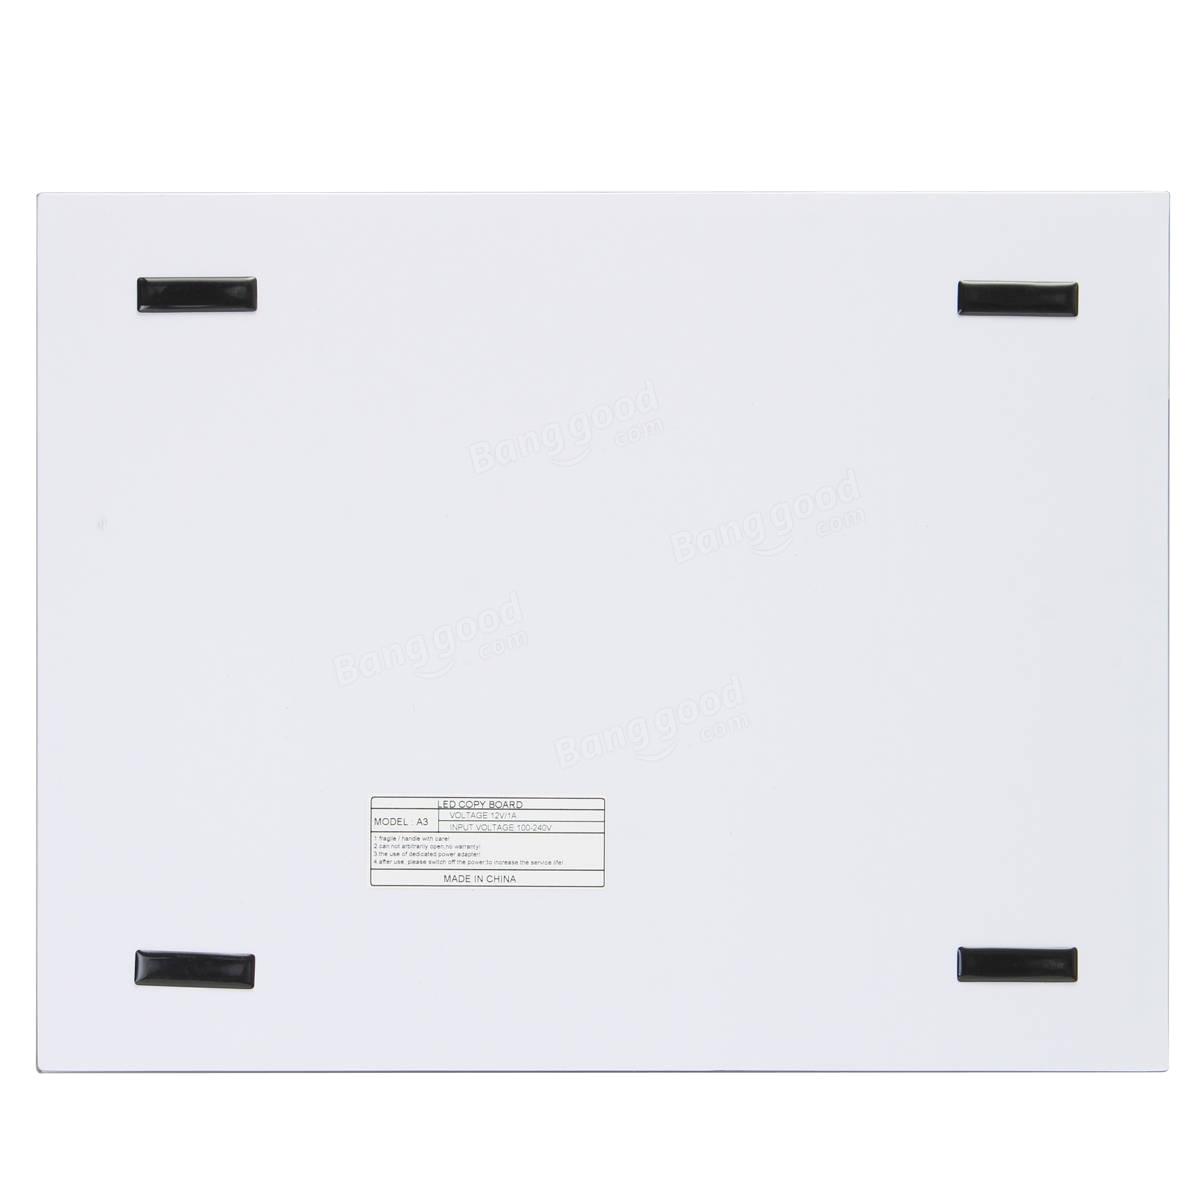 thin a3 led light box tracing board art design stencil drawing pattern copy pad